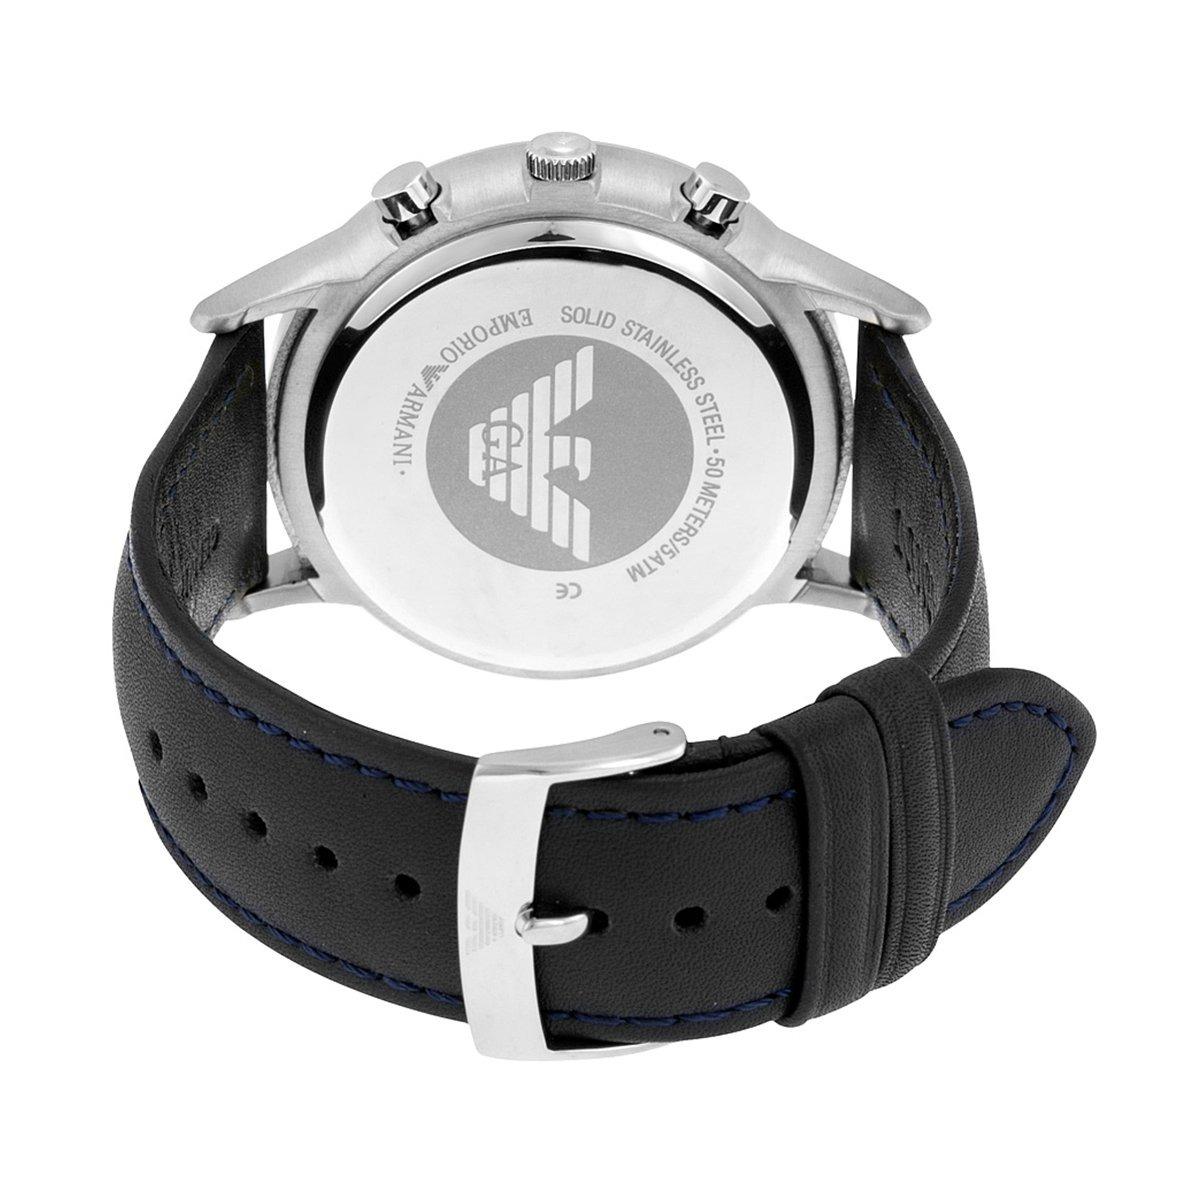 d440607b8d2 reloj emporio armani hombre ar2473 cronógrafo envío gratis!! Cargando zoom.